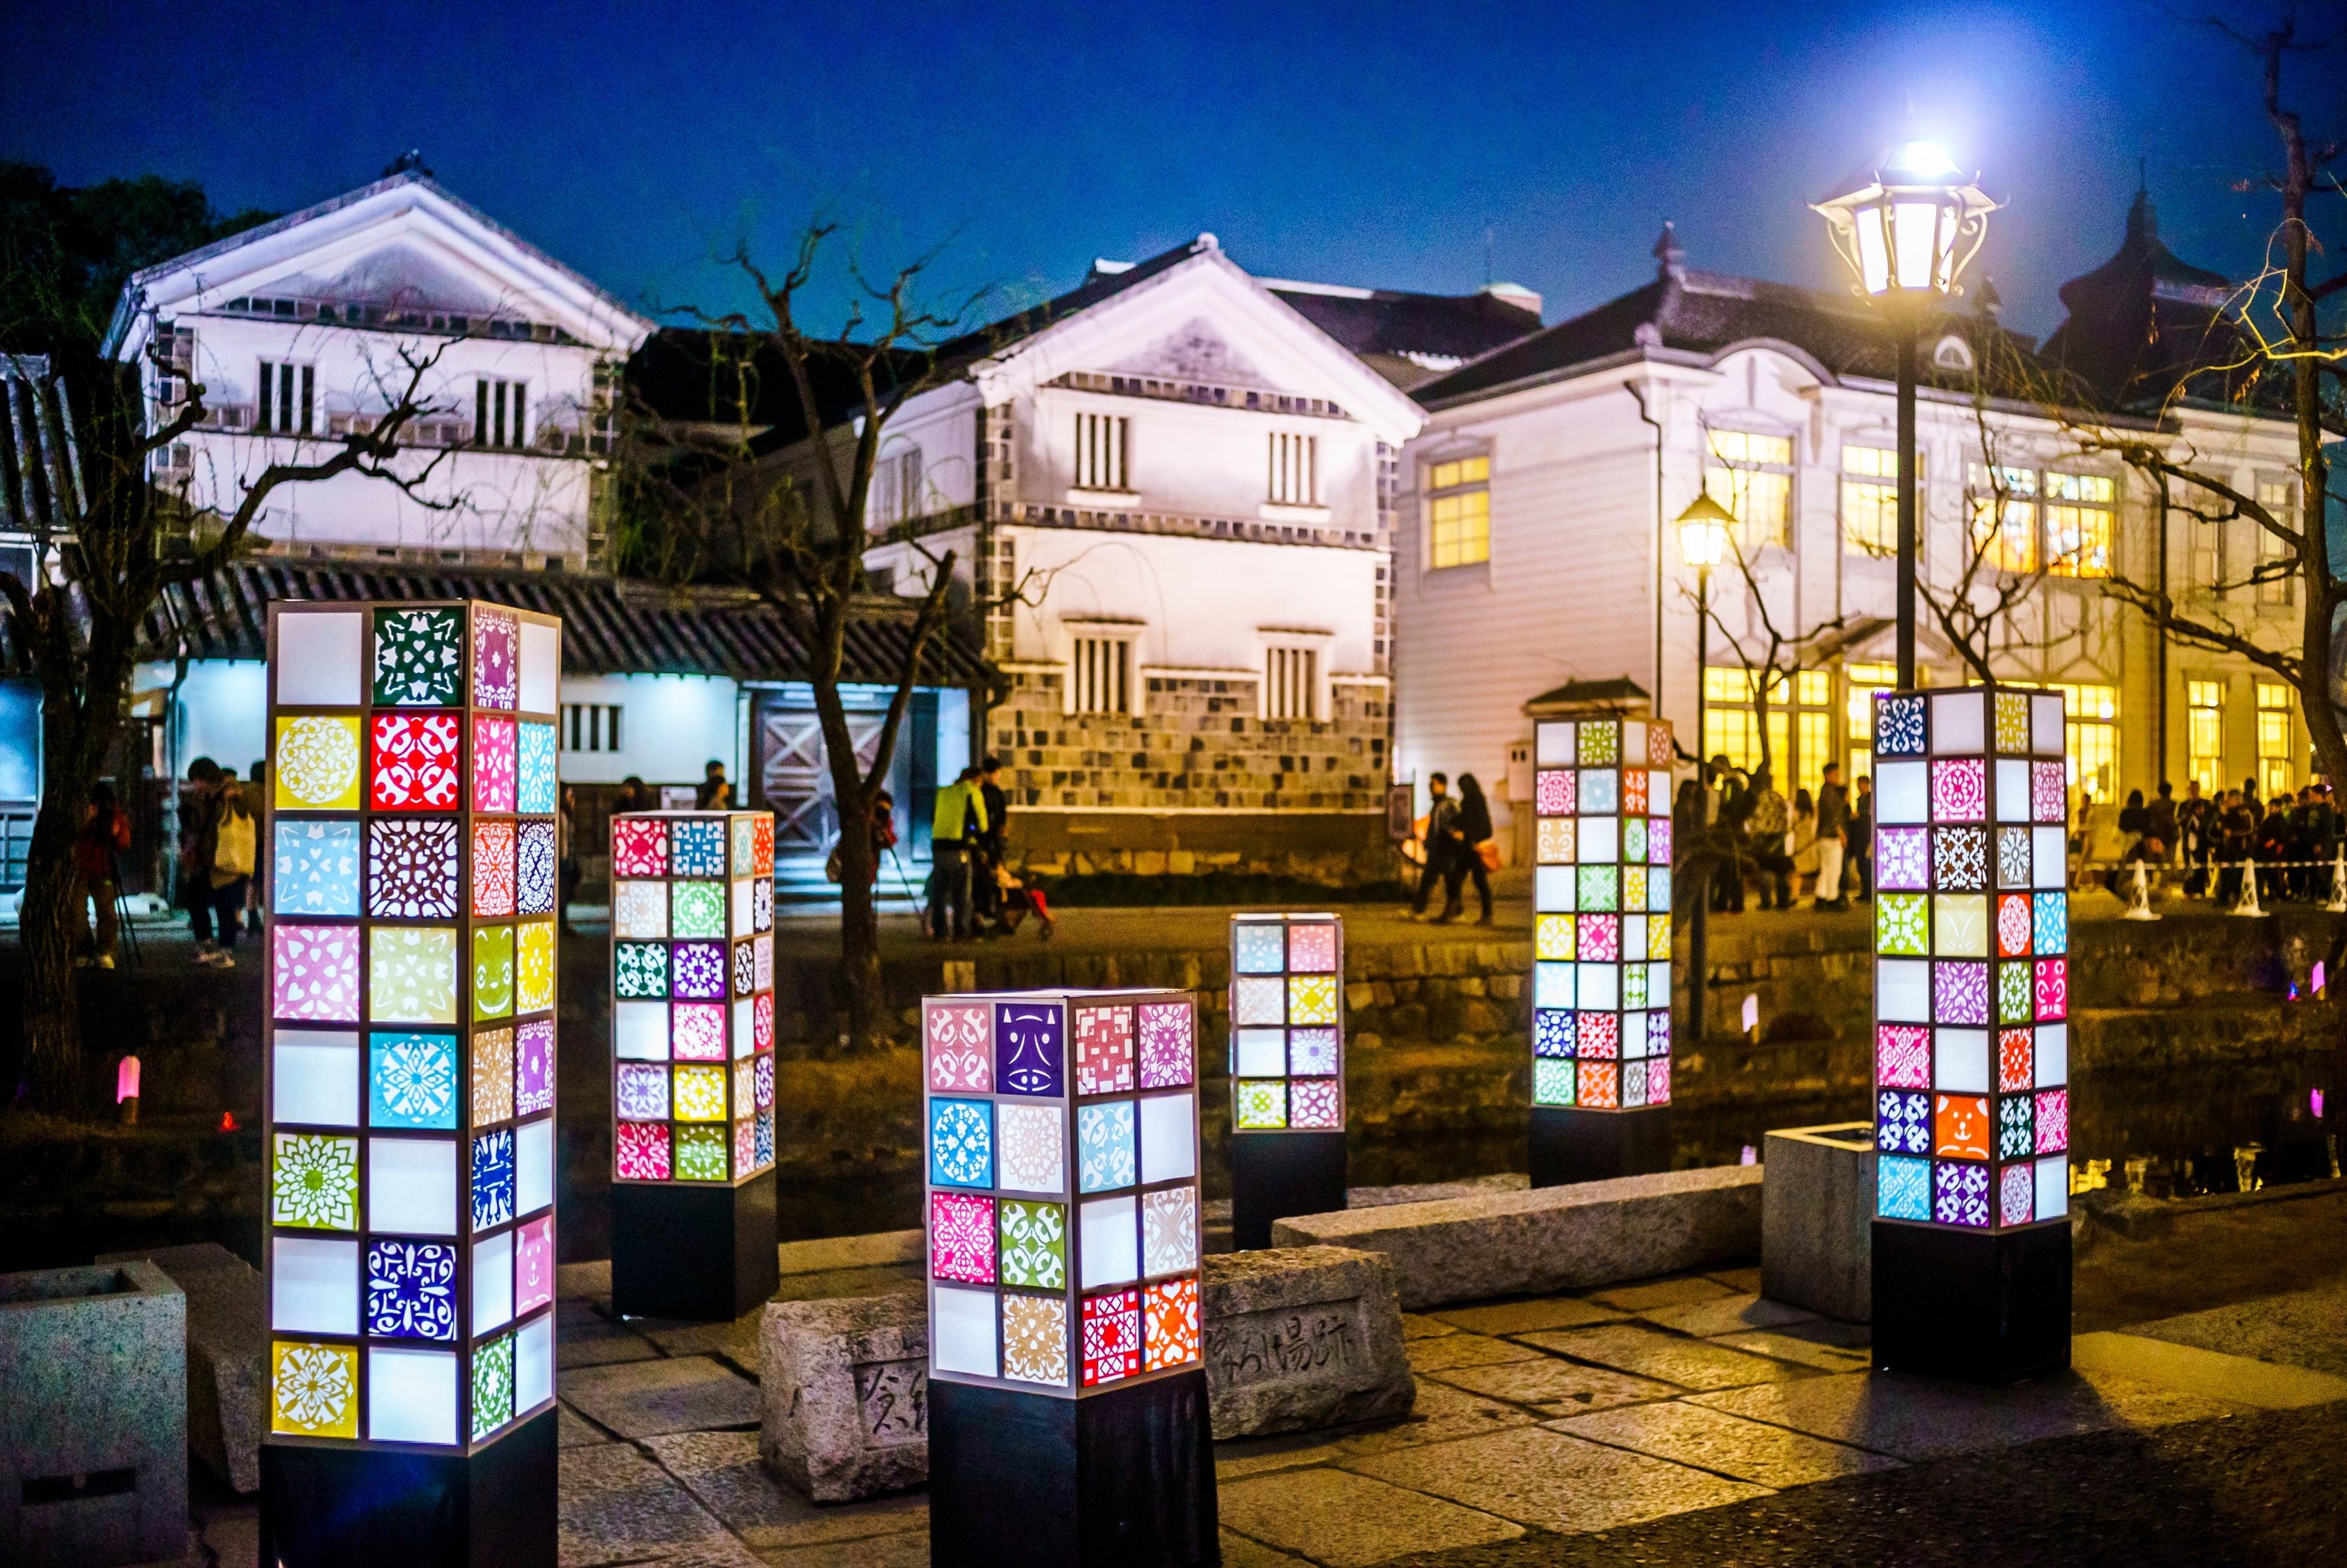 Illumination dans le quartier historique de Kurashiki Bikan